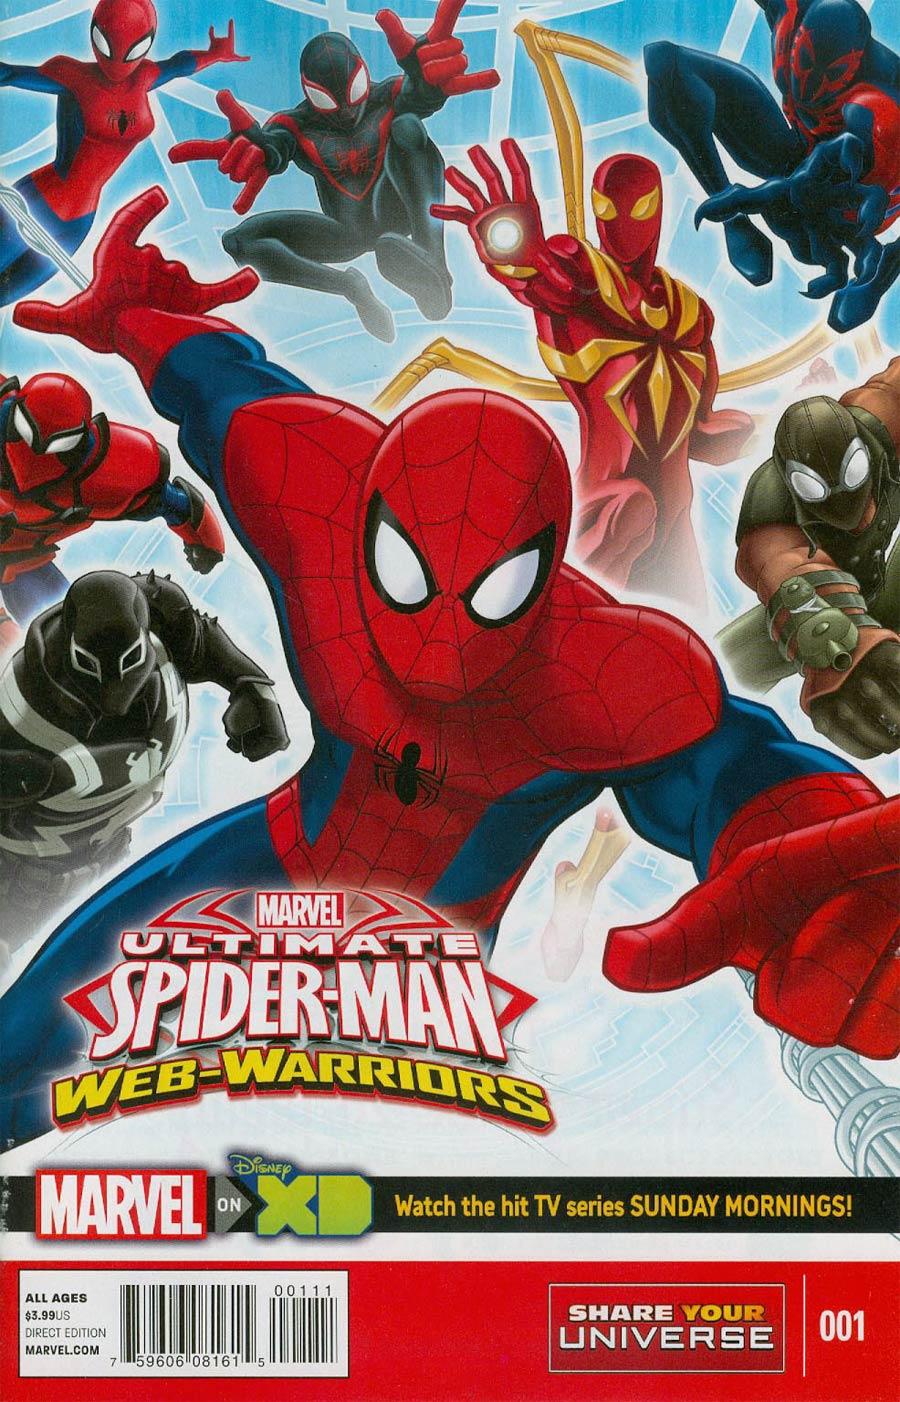 Marvel Universe Ultimate Spider-Man Web Warriors #1